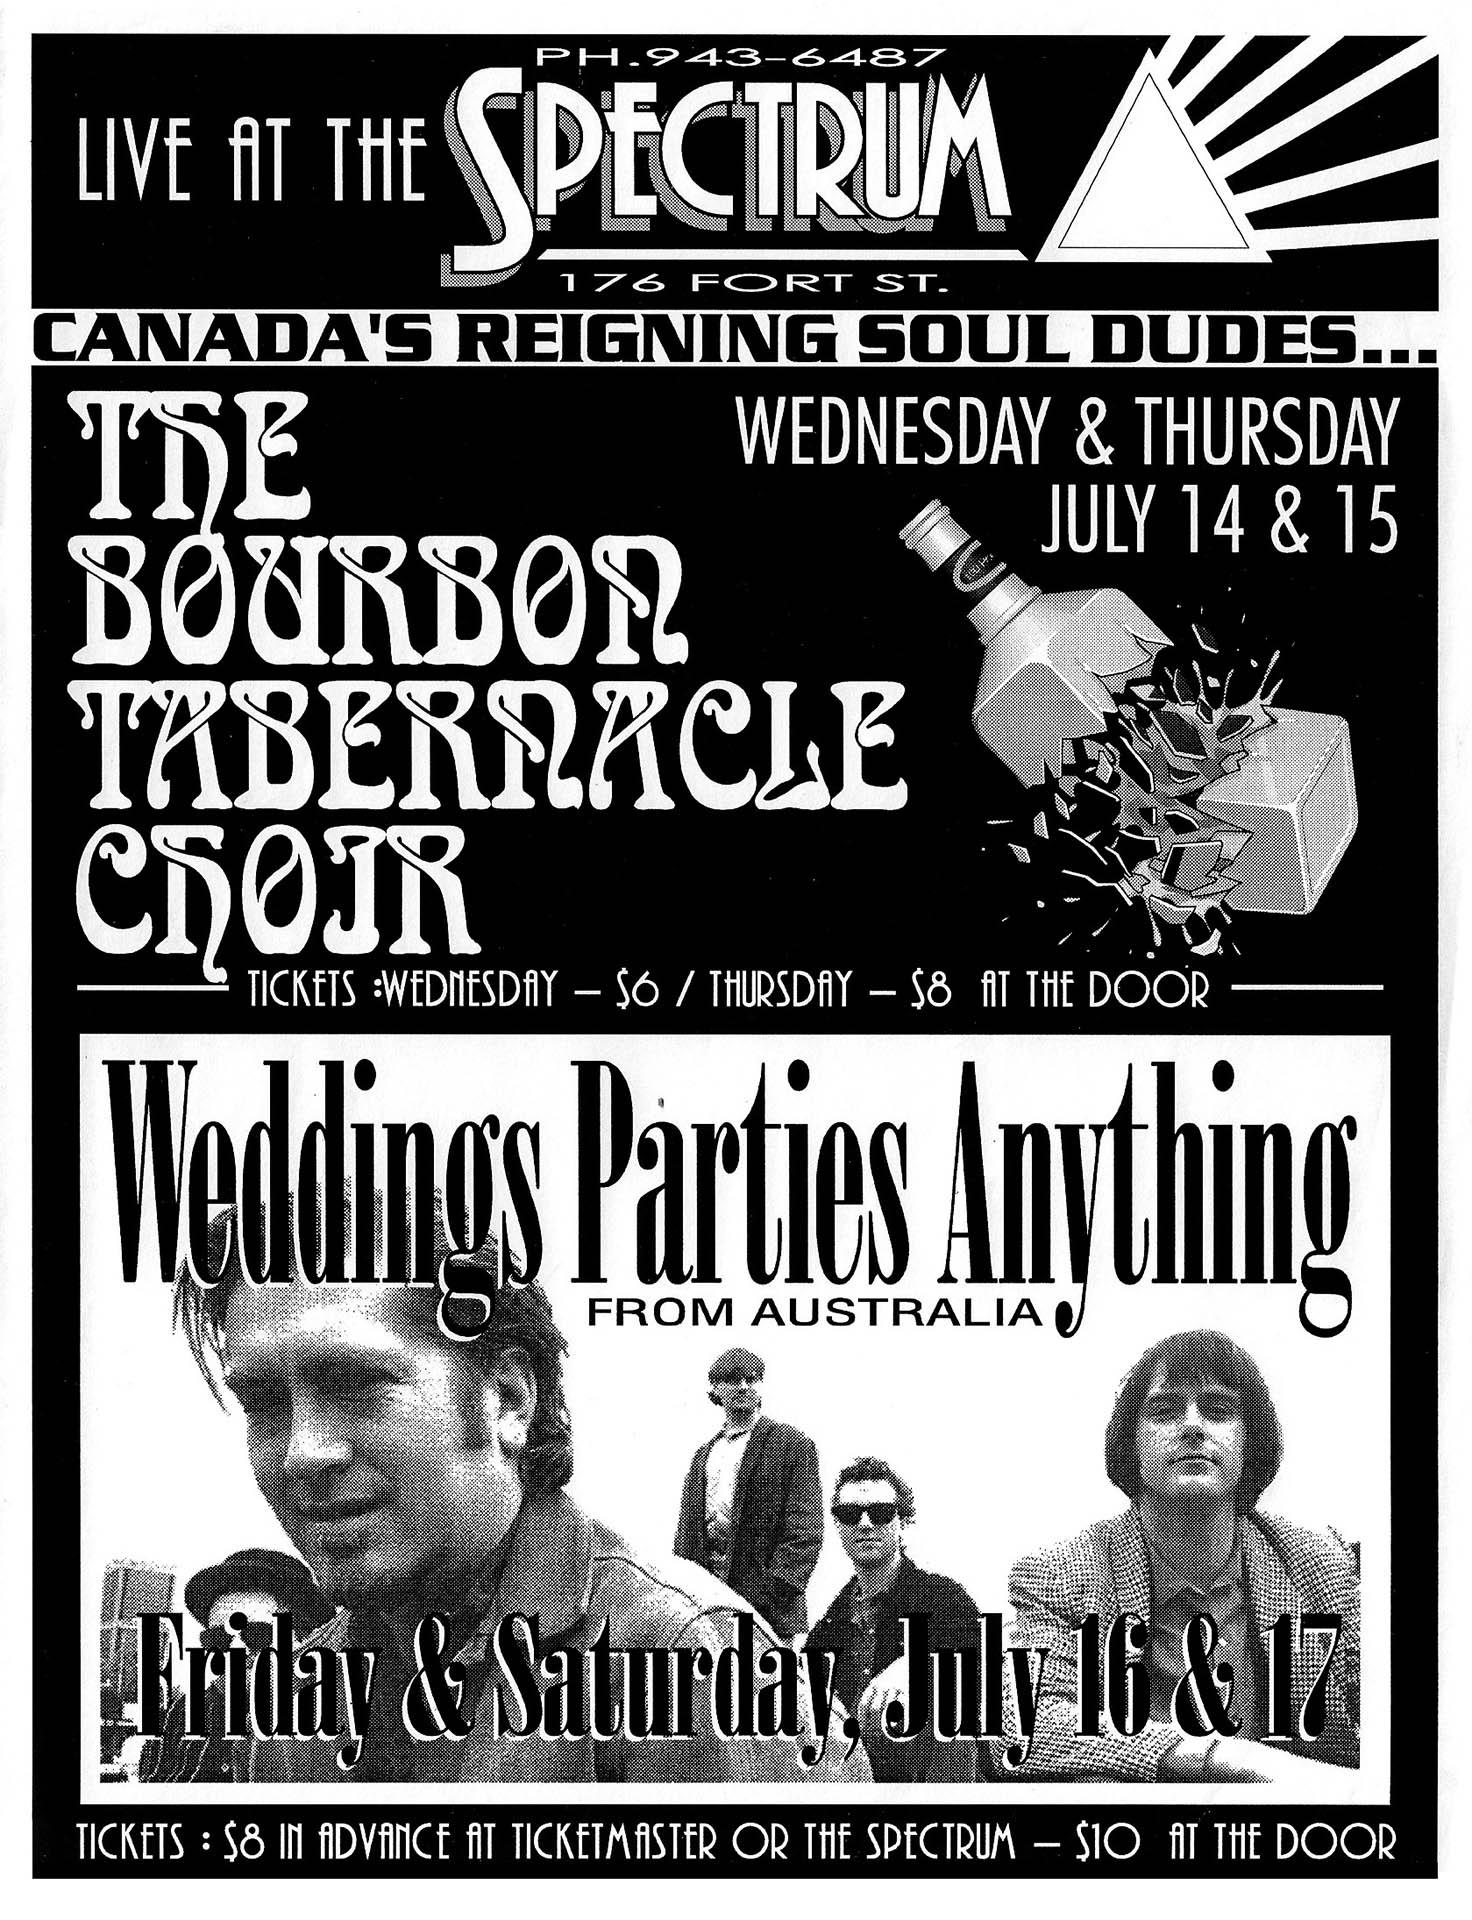 The Bourbon Tabernacle Choir - 1993